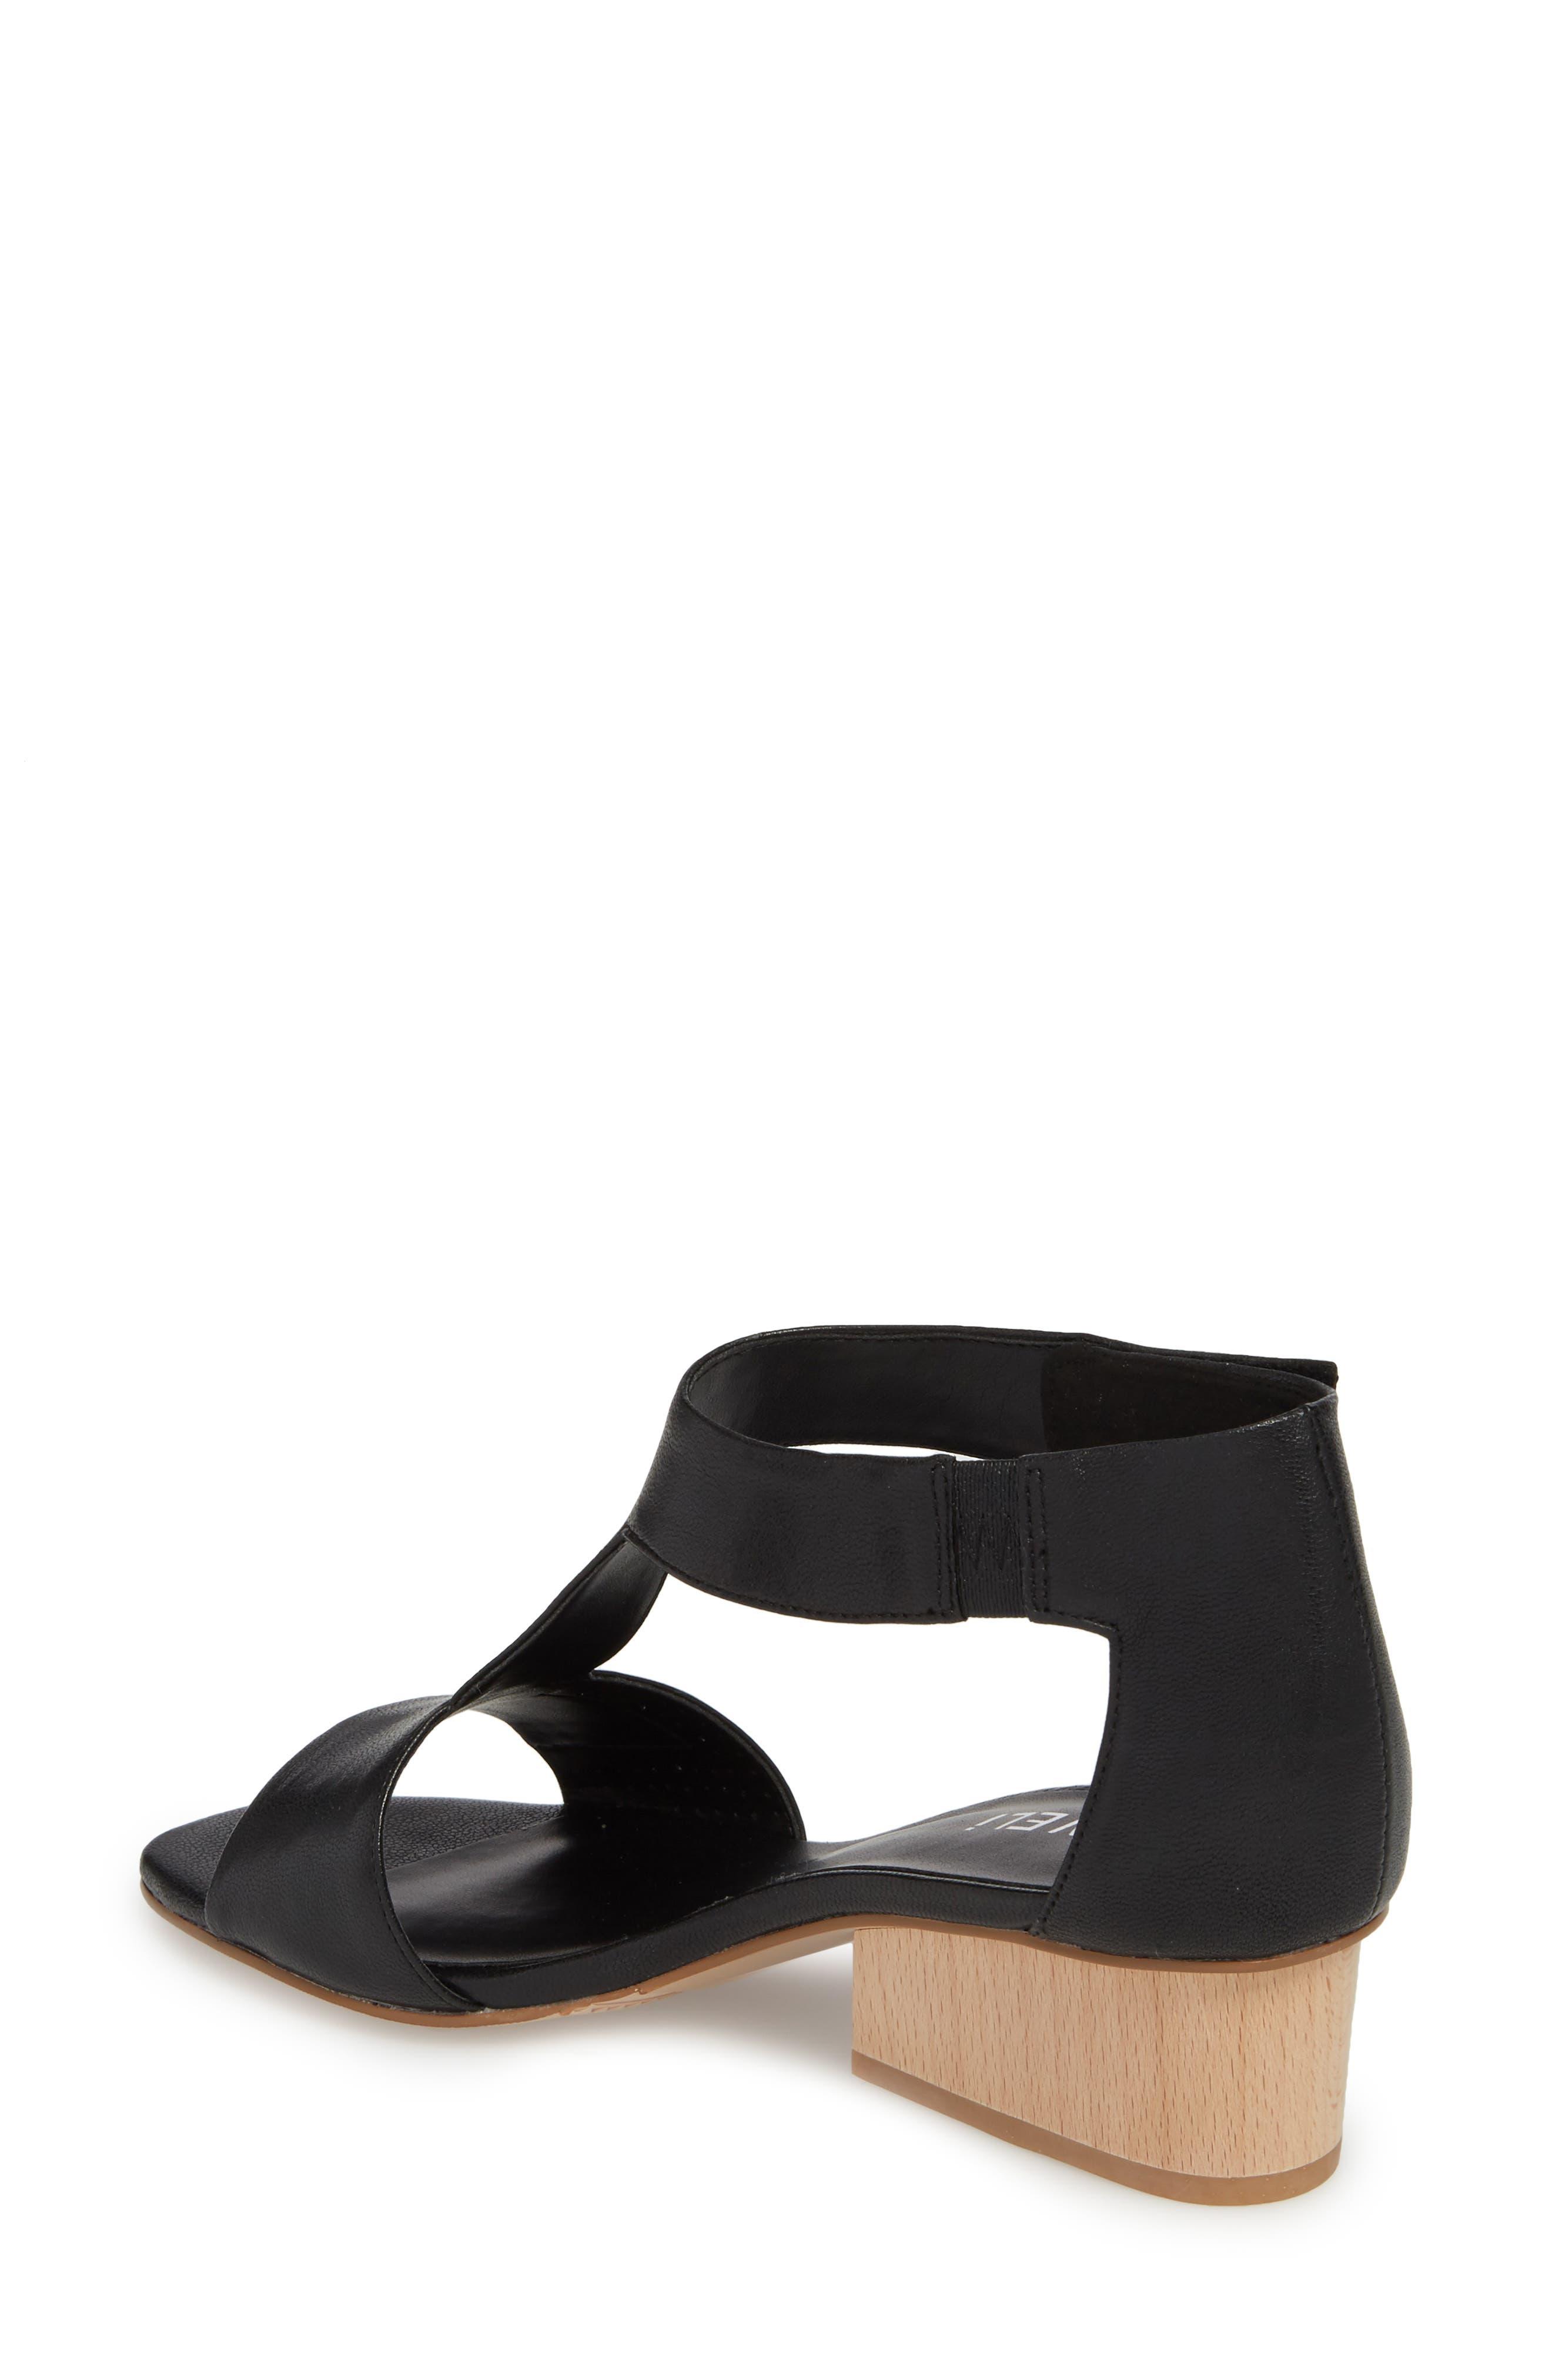 Calyx Block Heel Sandal,                             Alternate thumbnail 2, color,                             BLACK LEATHER